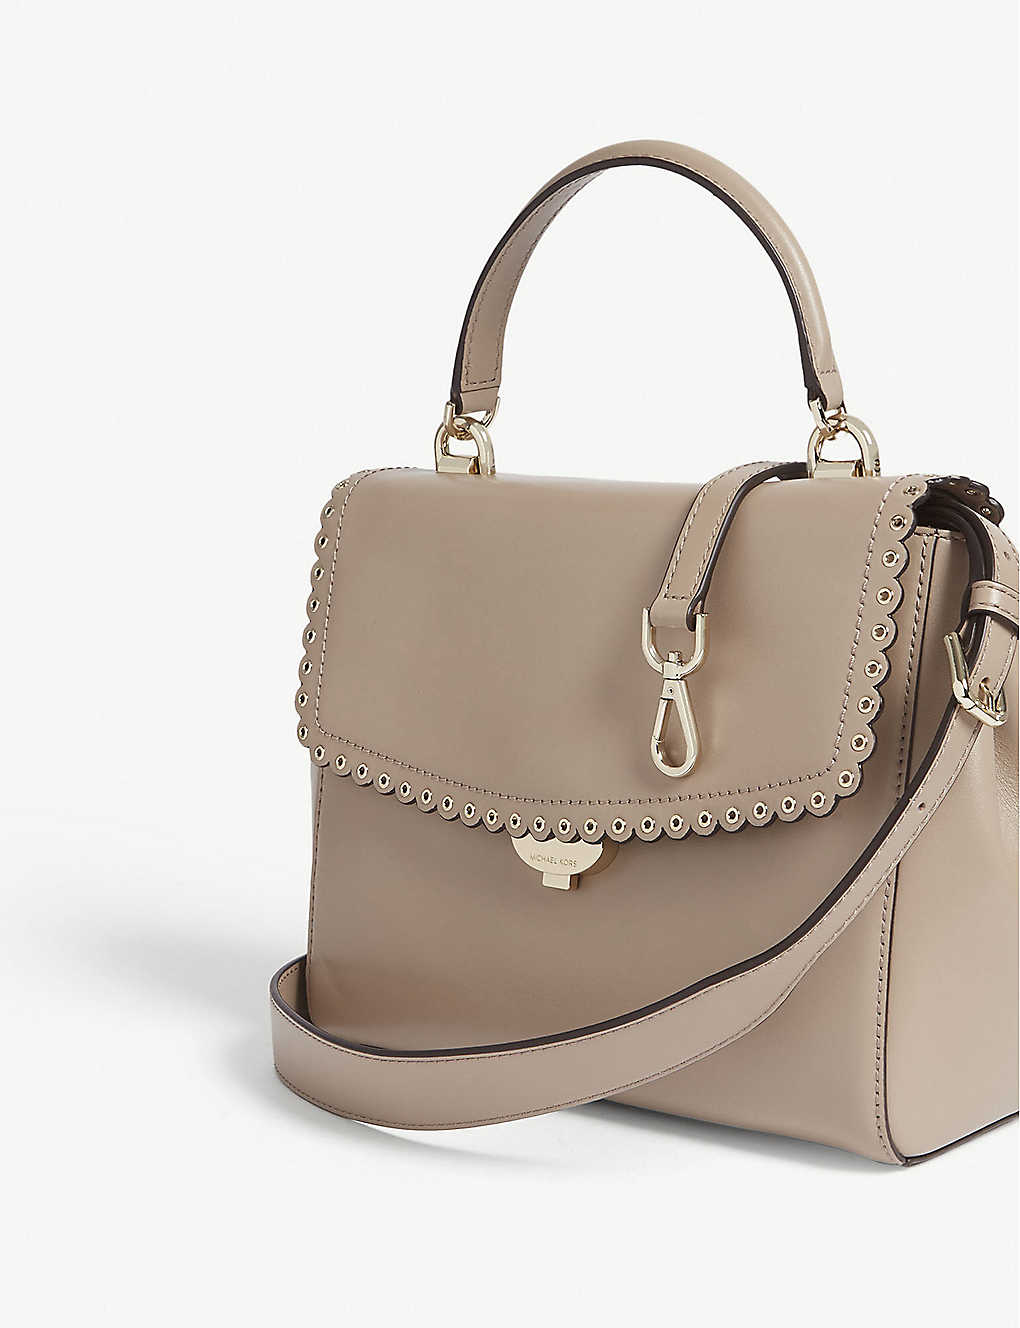 cc90d5fb9f28 MICHAEL MICHAEL KORS - Ava medium scalloped leather shoulder bag ...